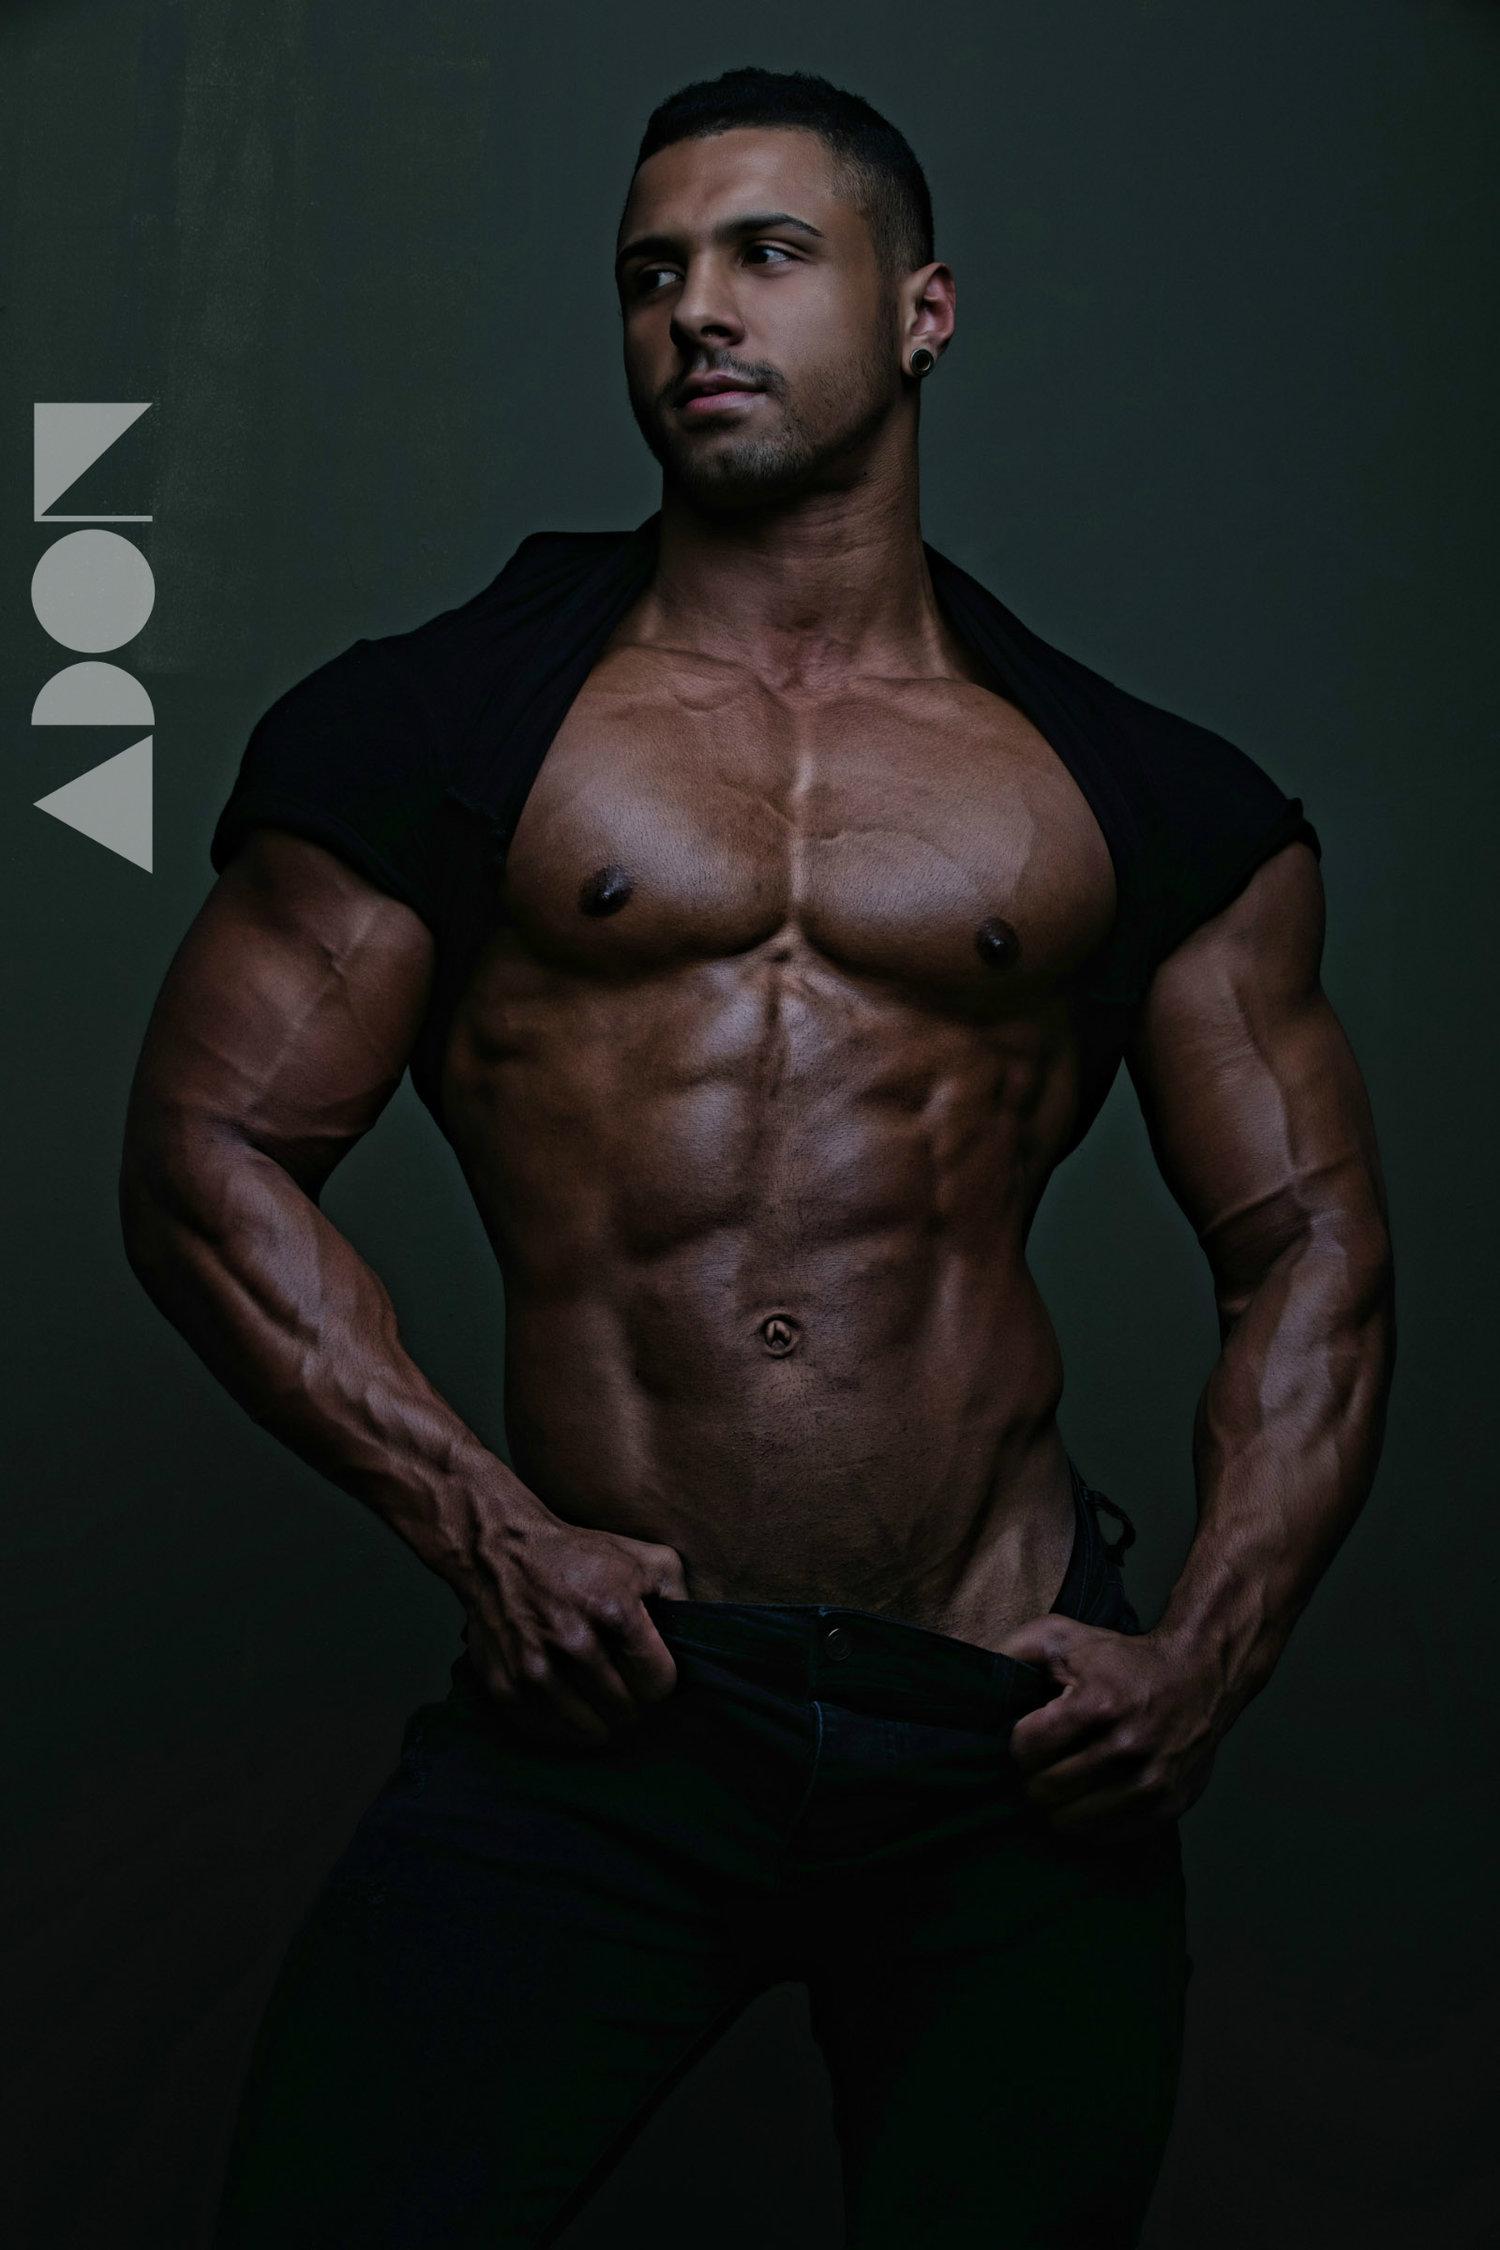 Adon Exclusive: Model Eric Uchoa By Joan Crisol